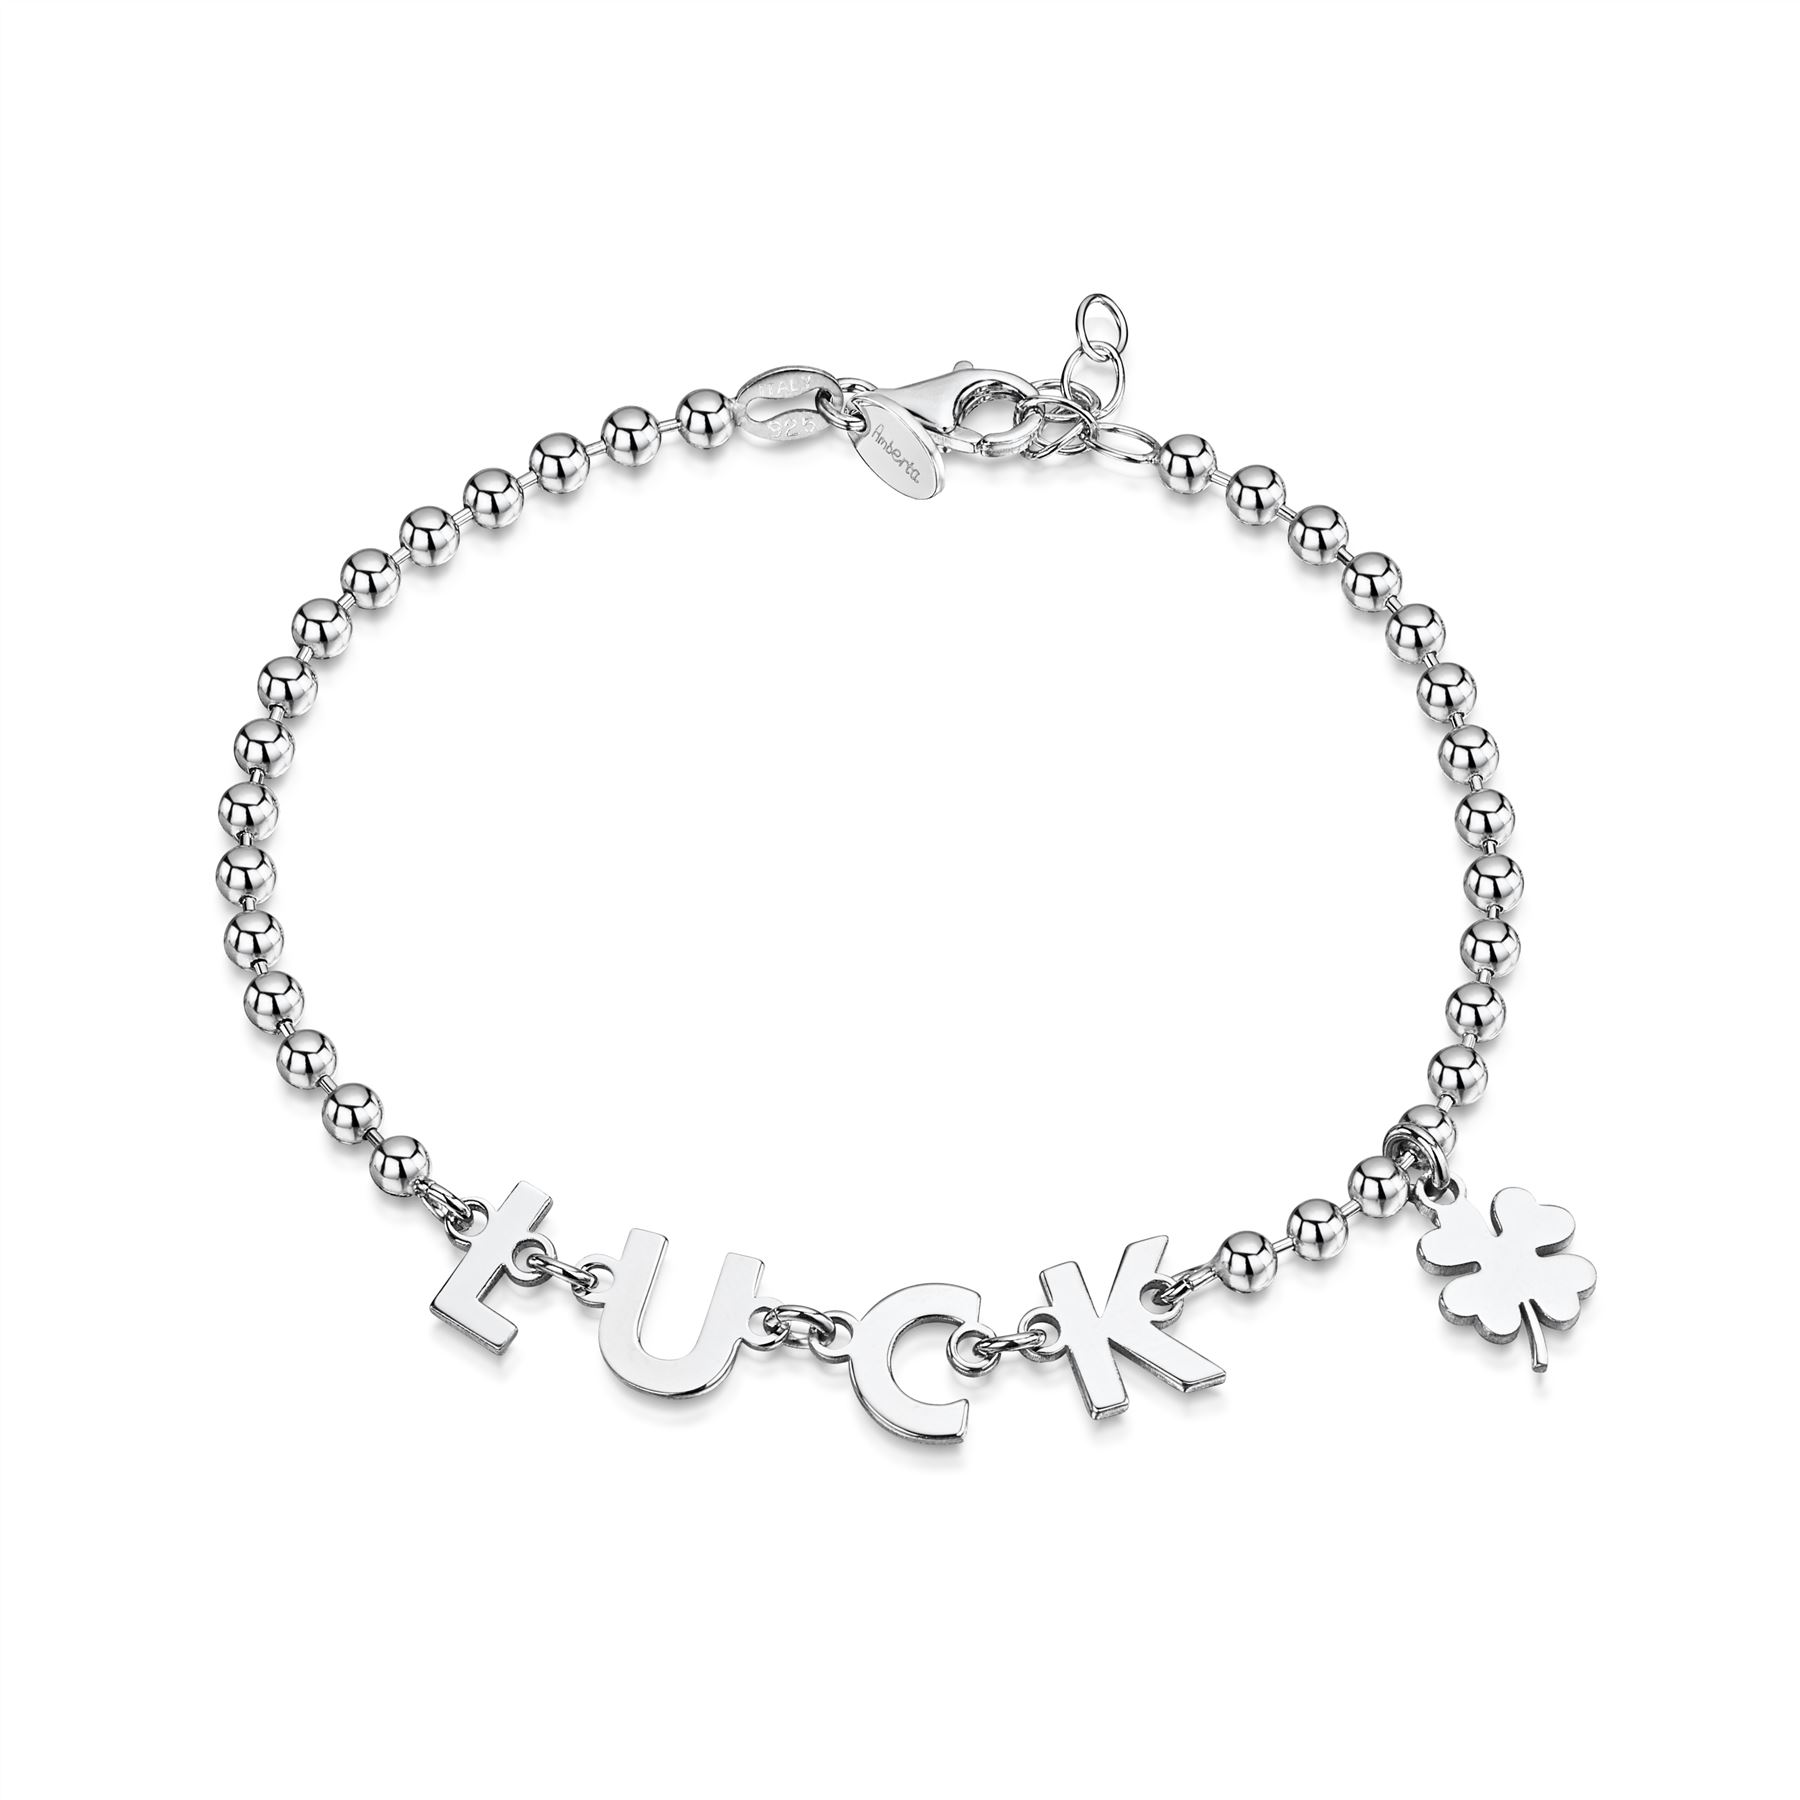 Amberta-Jewelry-925-Sterling-Silver-Adjustable-Bracelet-Italian-Bangle-for-Women miniature 86